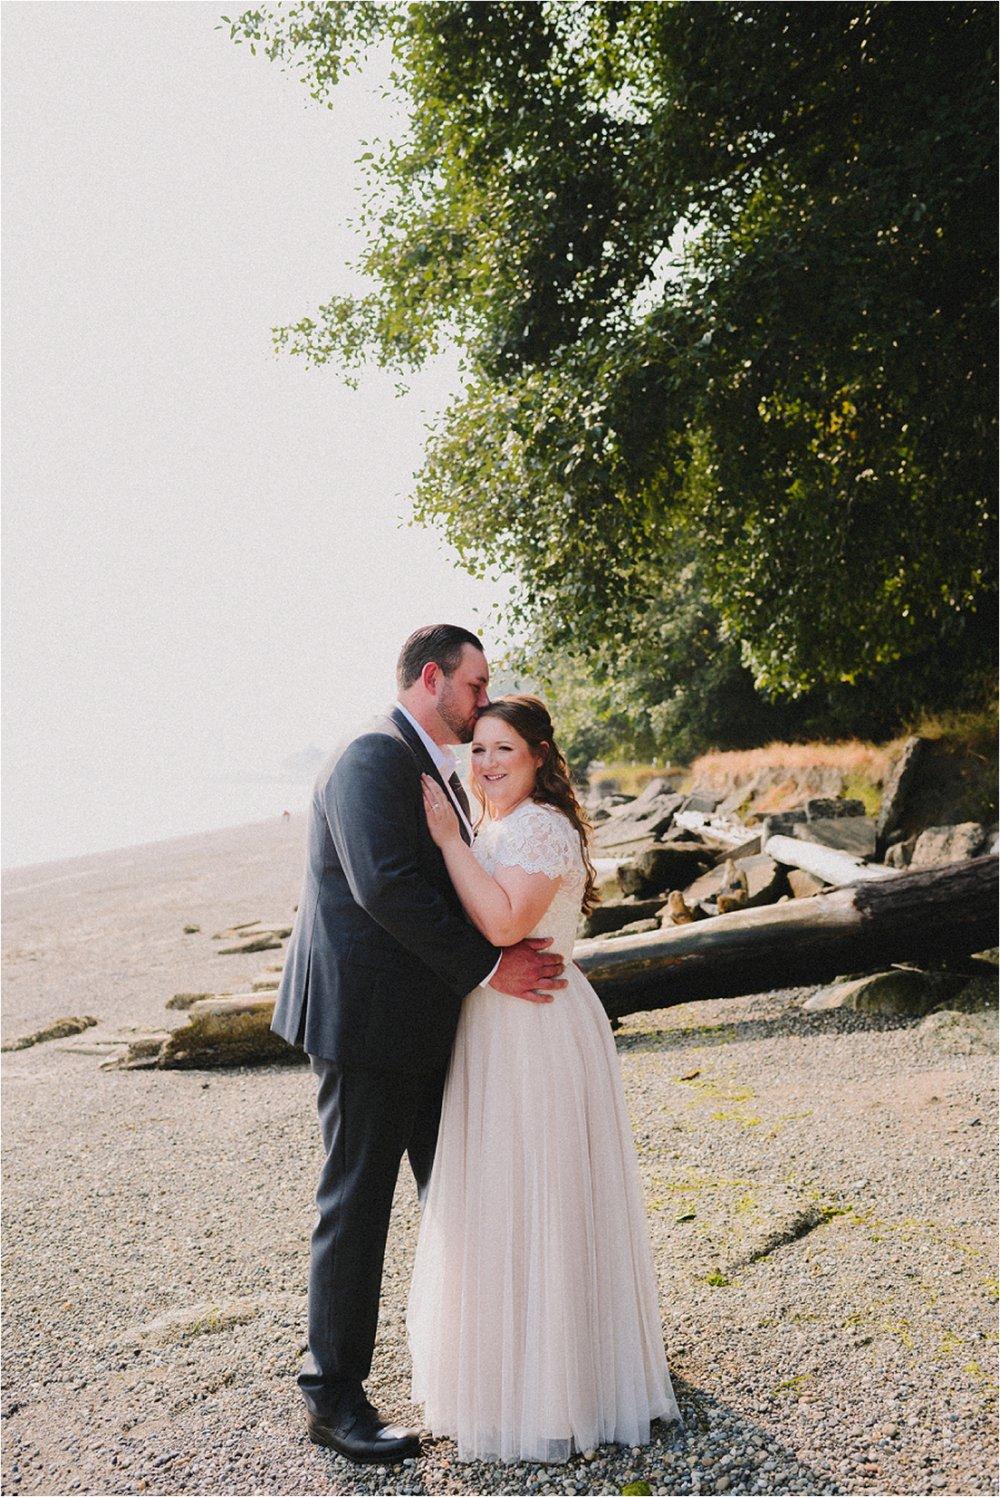 owen-beach-priest-point-park-tacoma-washington-elopement-jannicka-mayte-anchorage-alaska-wedding-elopement-photographer (11).jpg